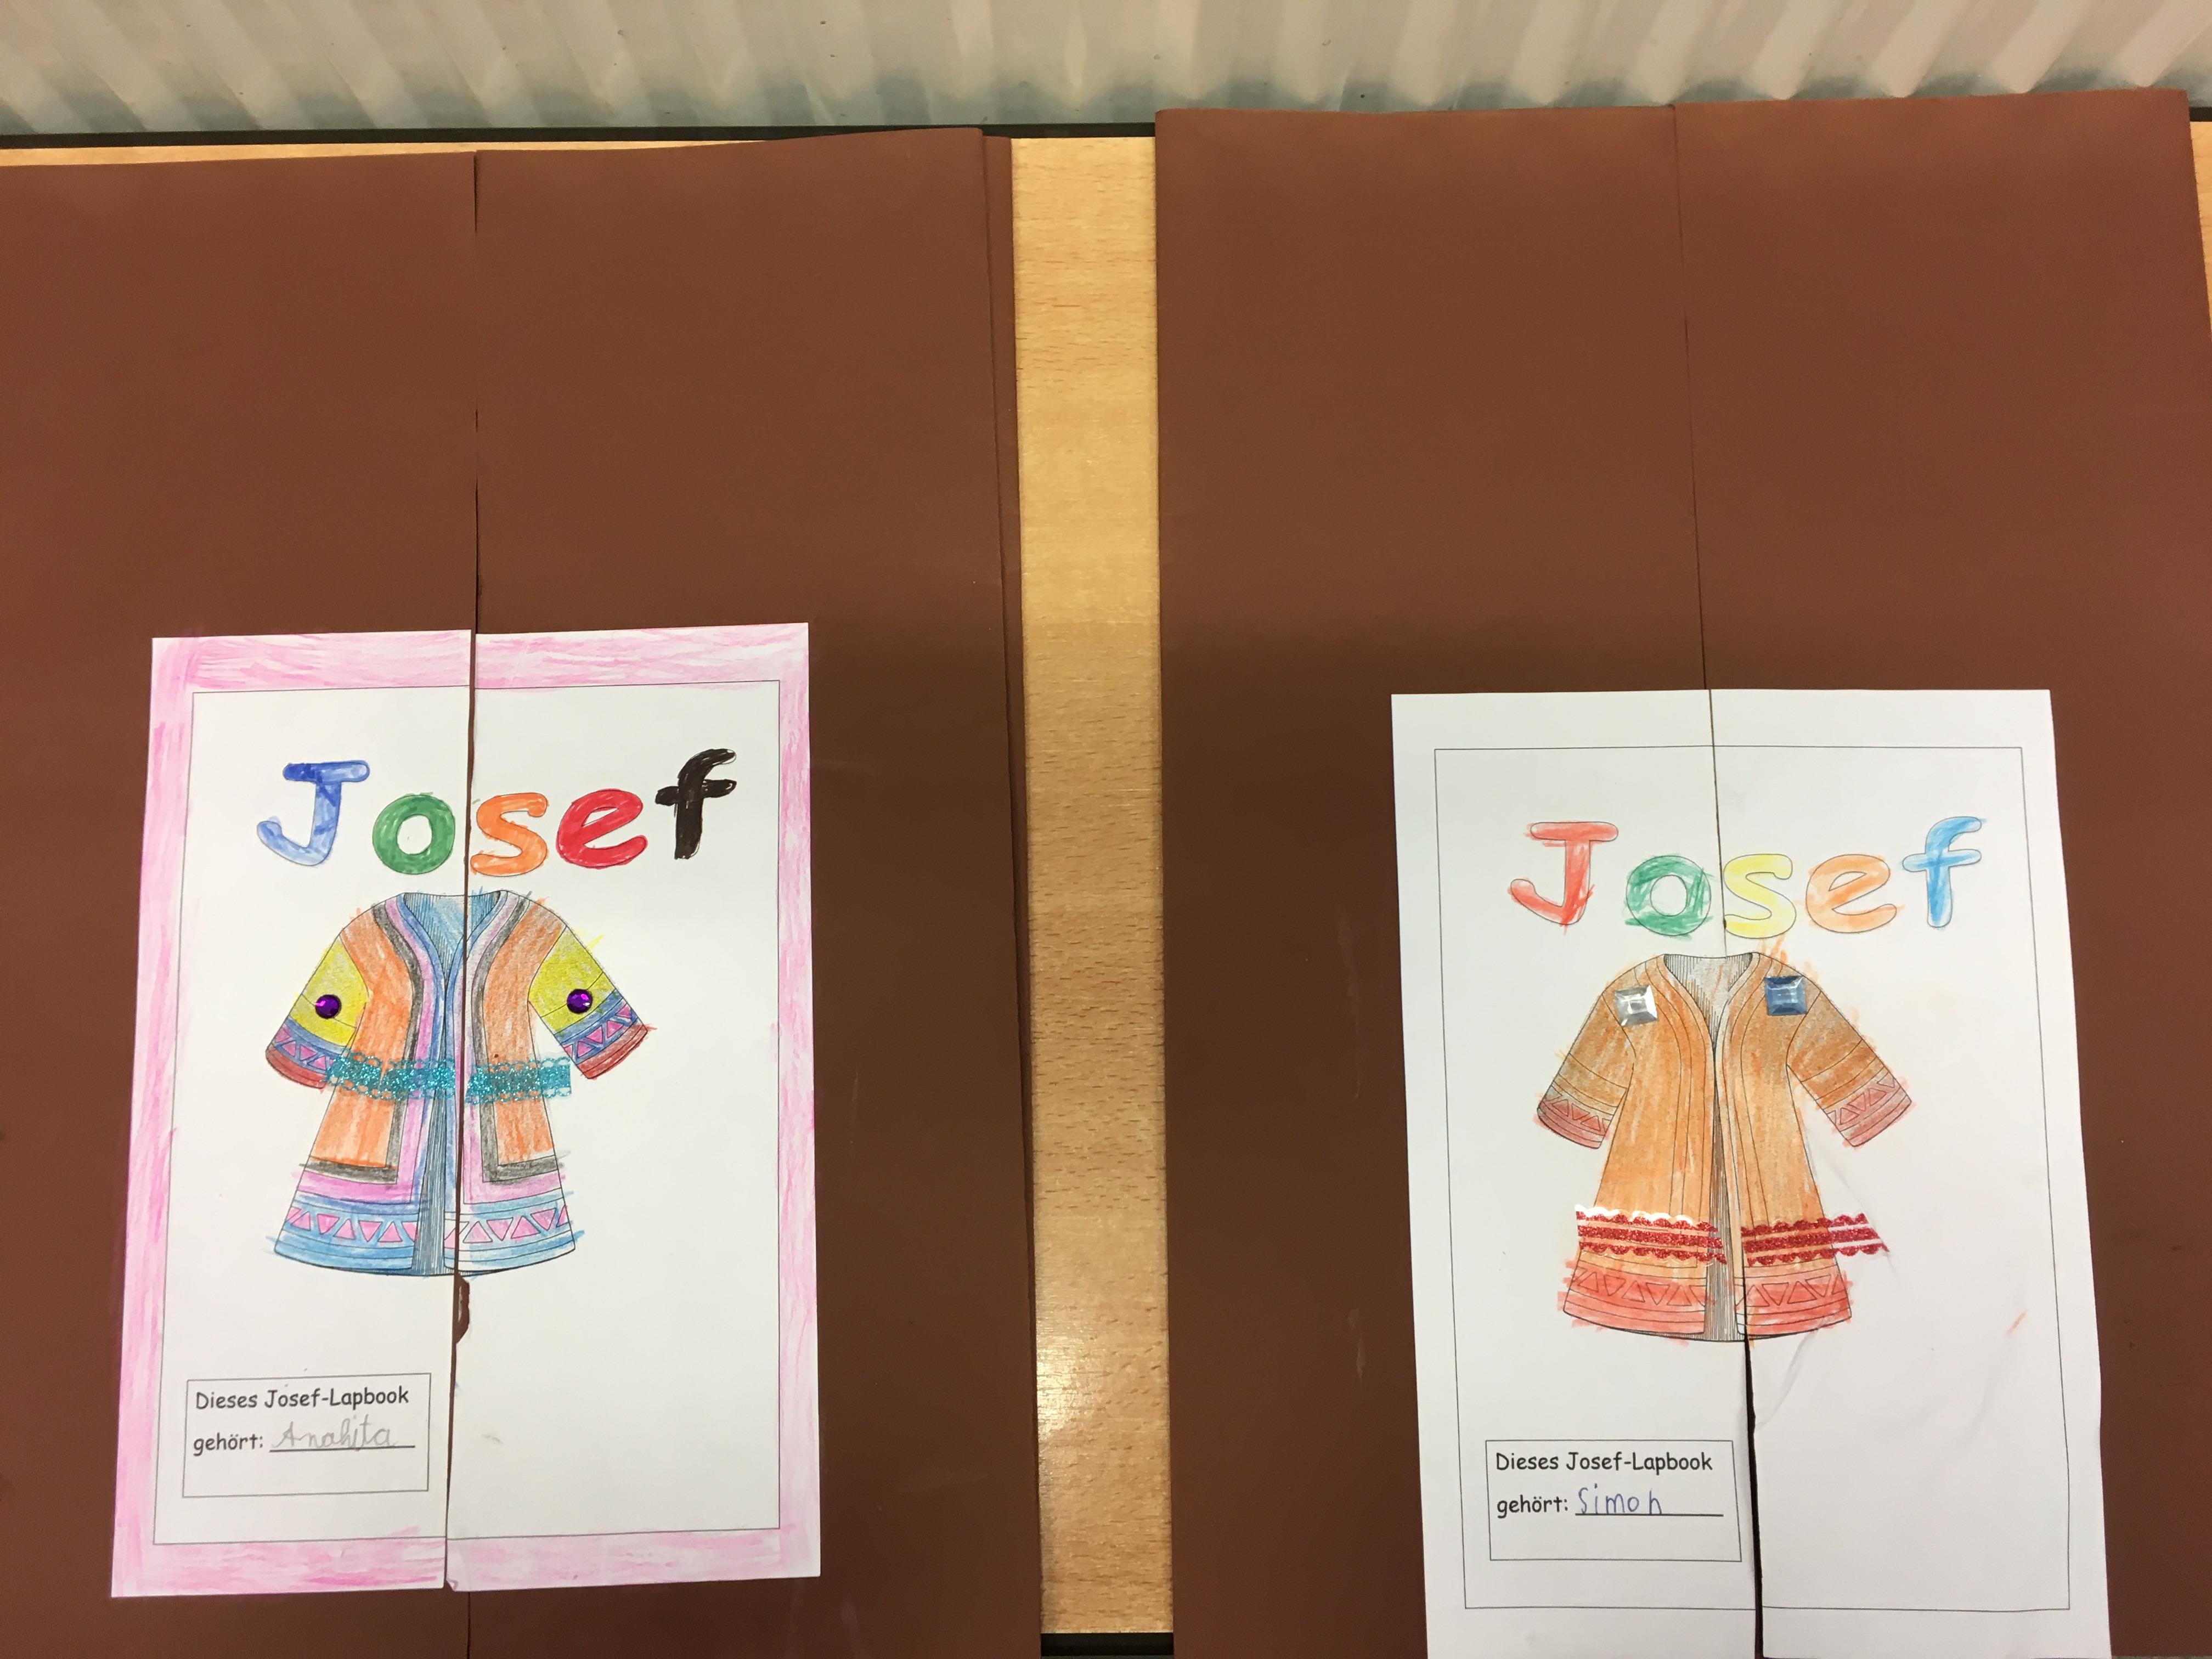 Josef | GGS Bad Driburg